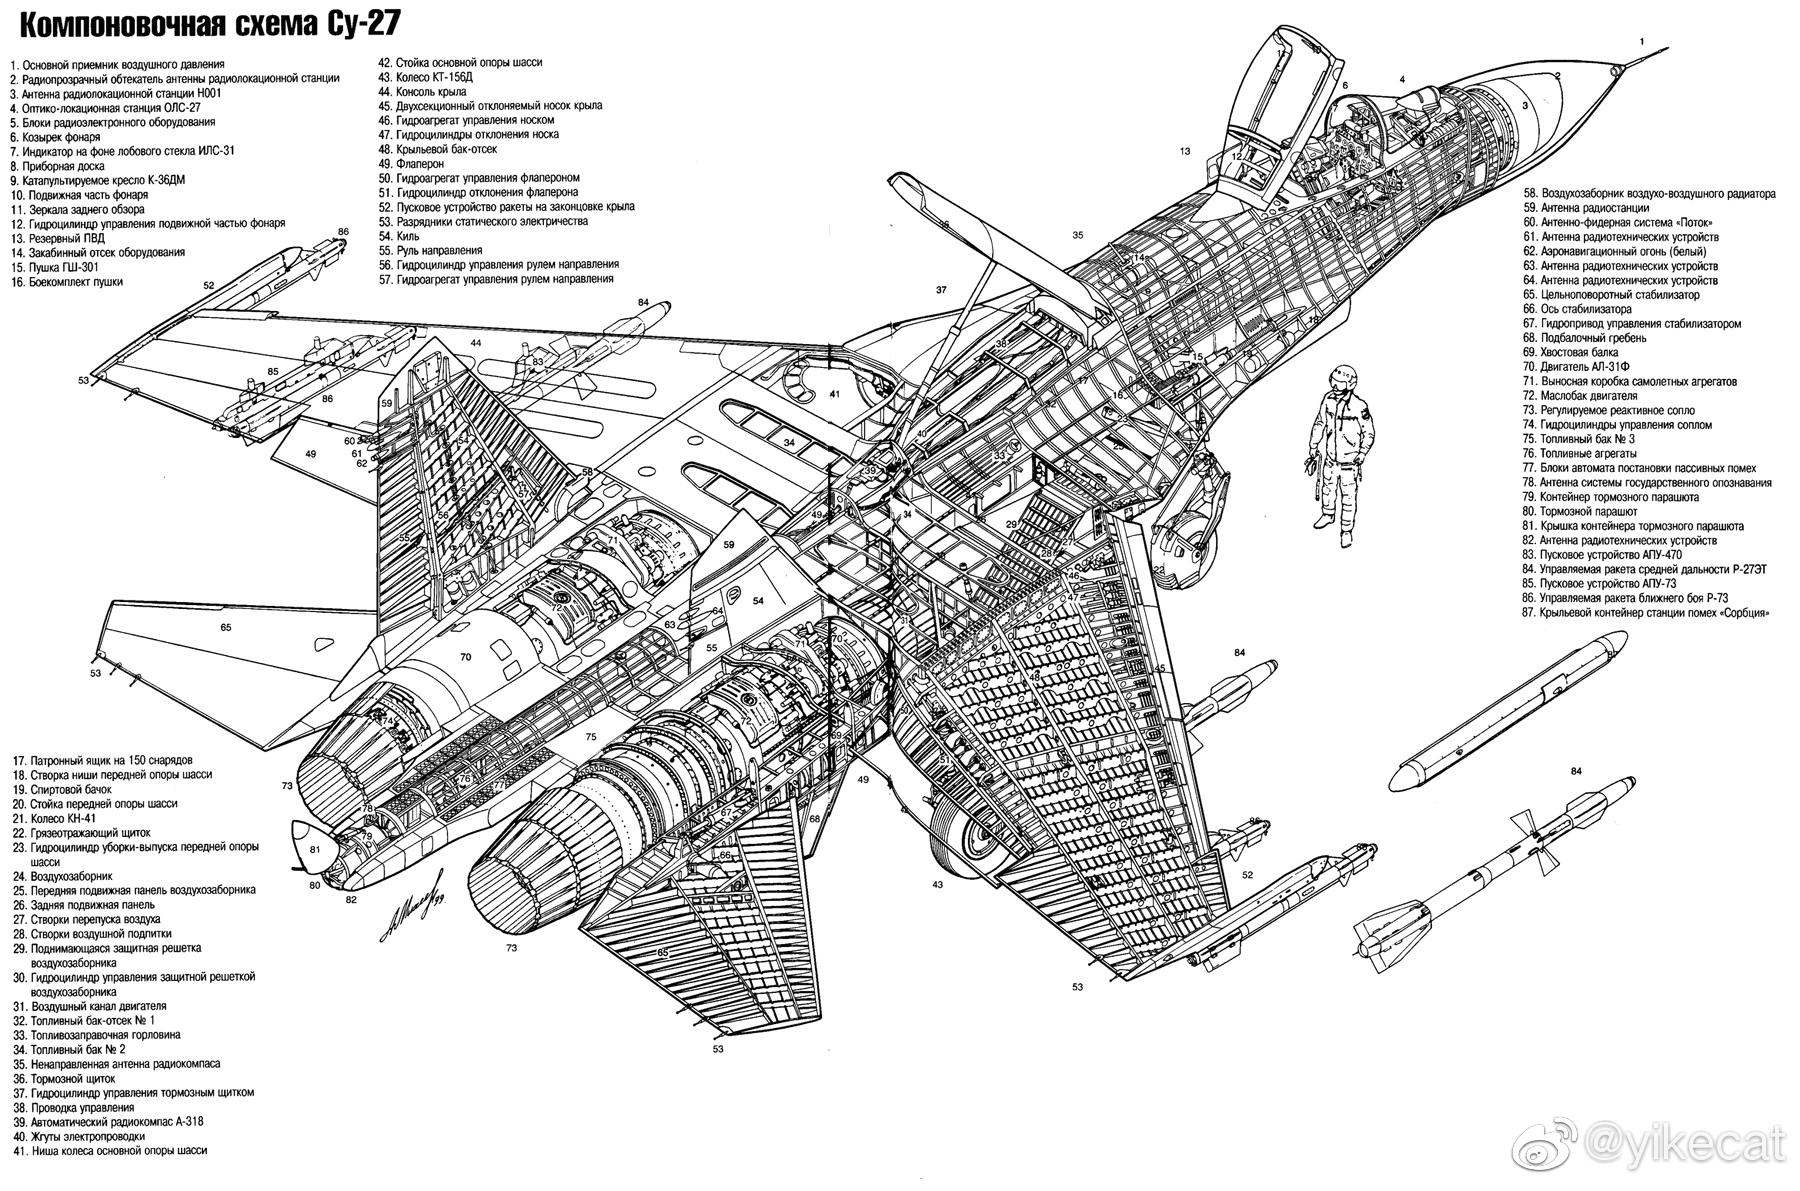 Сухой Су-27/Sukhoi Su-27多用途歼击机(本文系鄙人翻译的俄